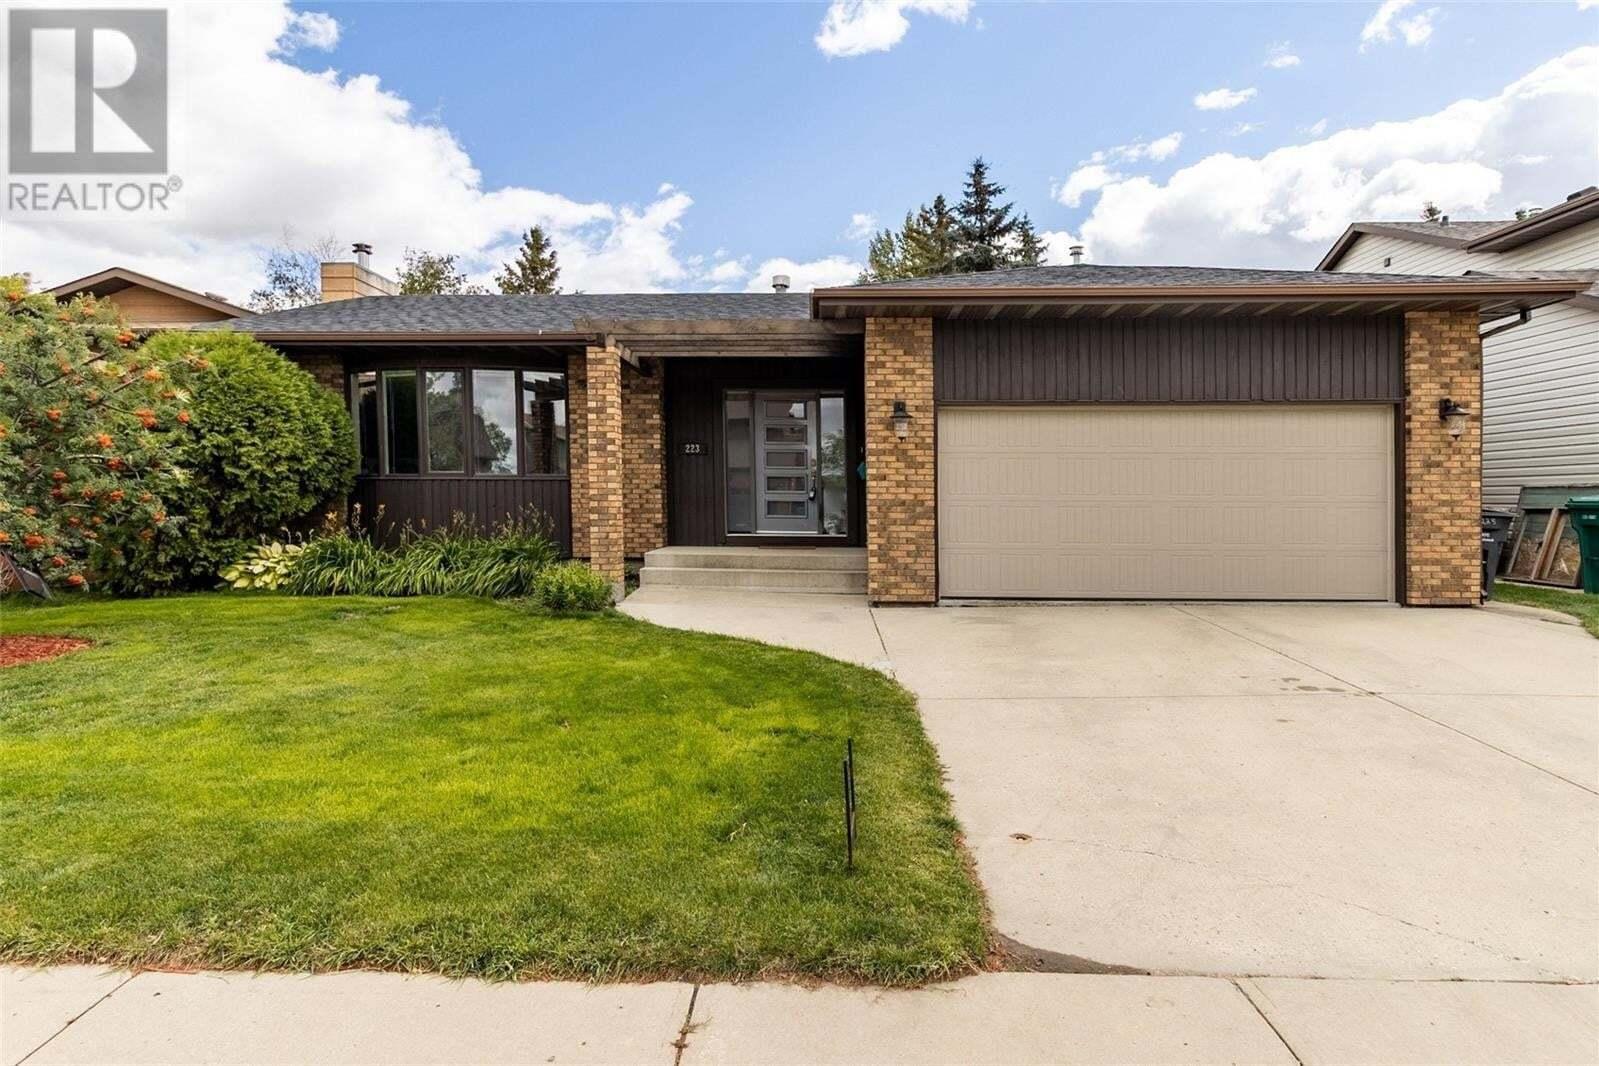 House for sale at 223 Whitewood Rd Saskatoon Saskatchewan - MLS: SK825890